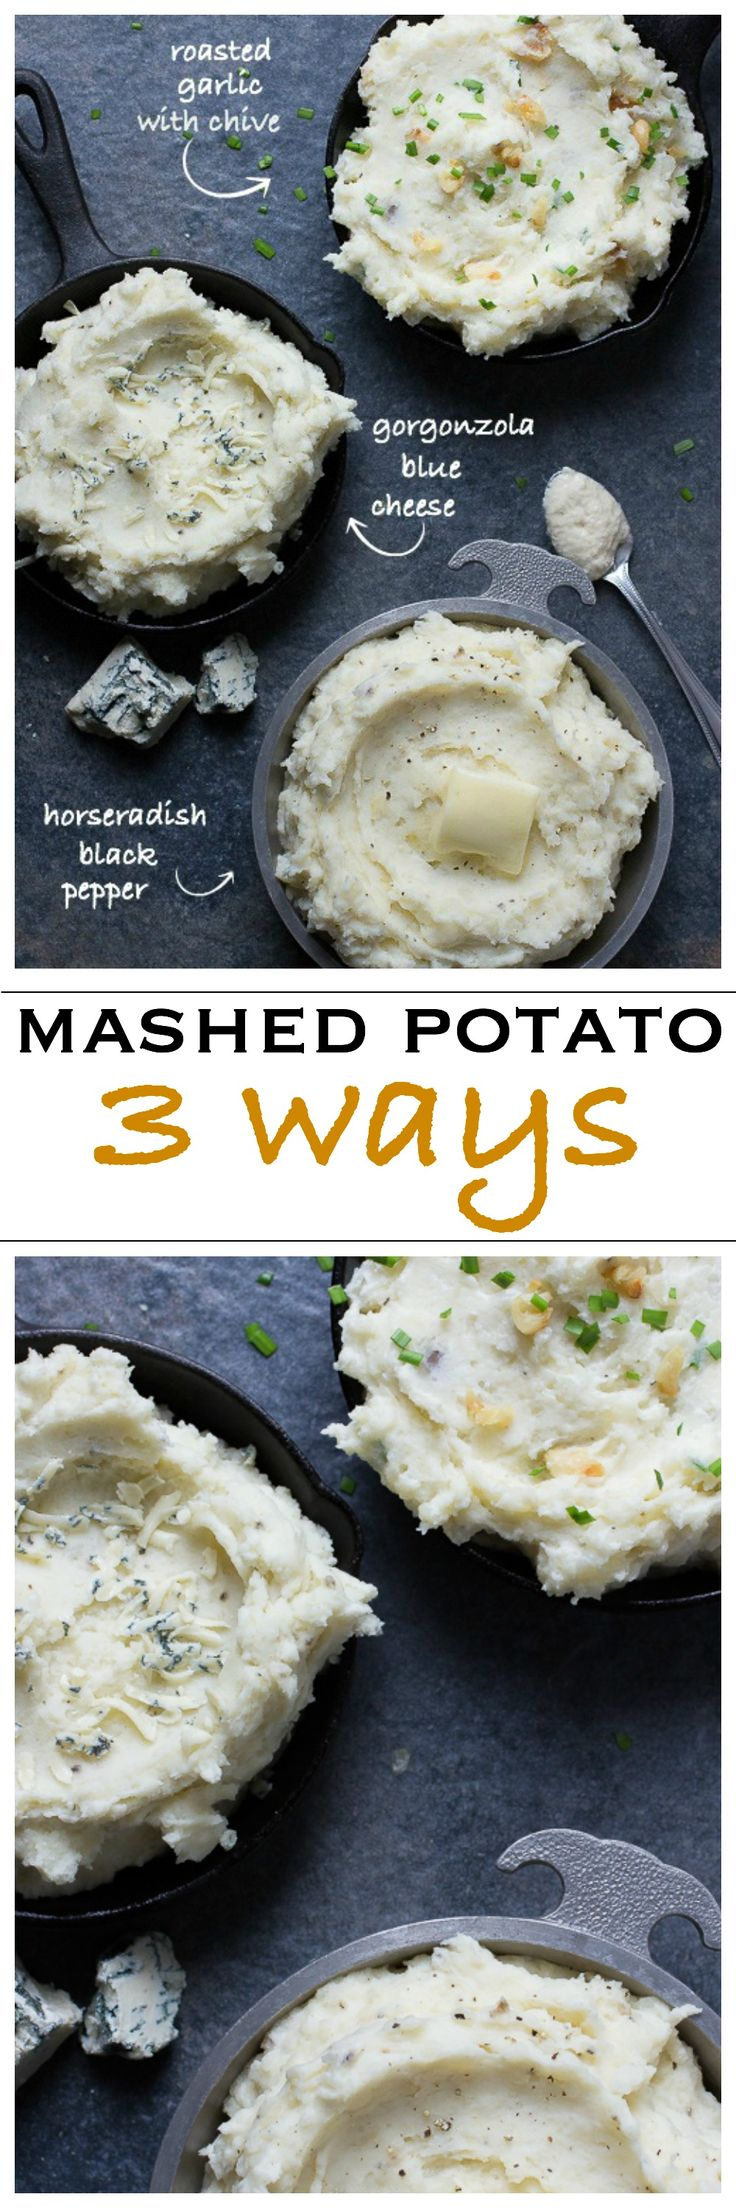 potato creamy mashed potatoes dinner plates roasted garlic blue cheese ...